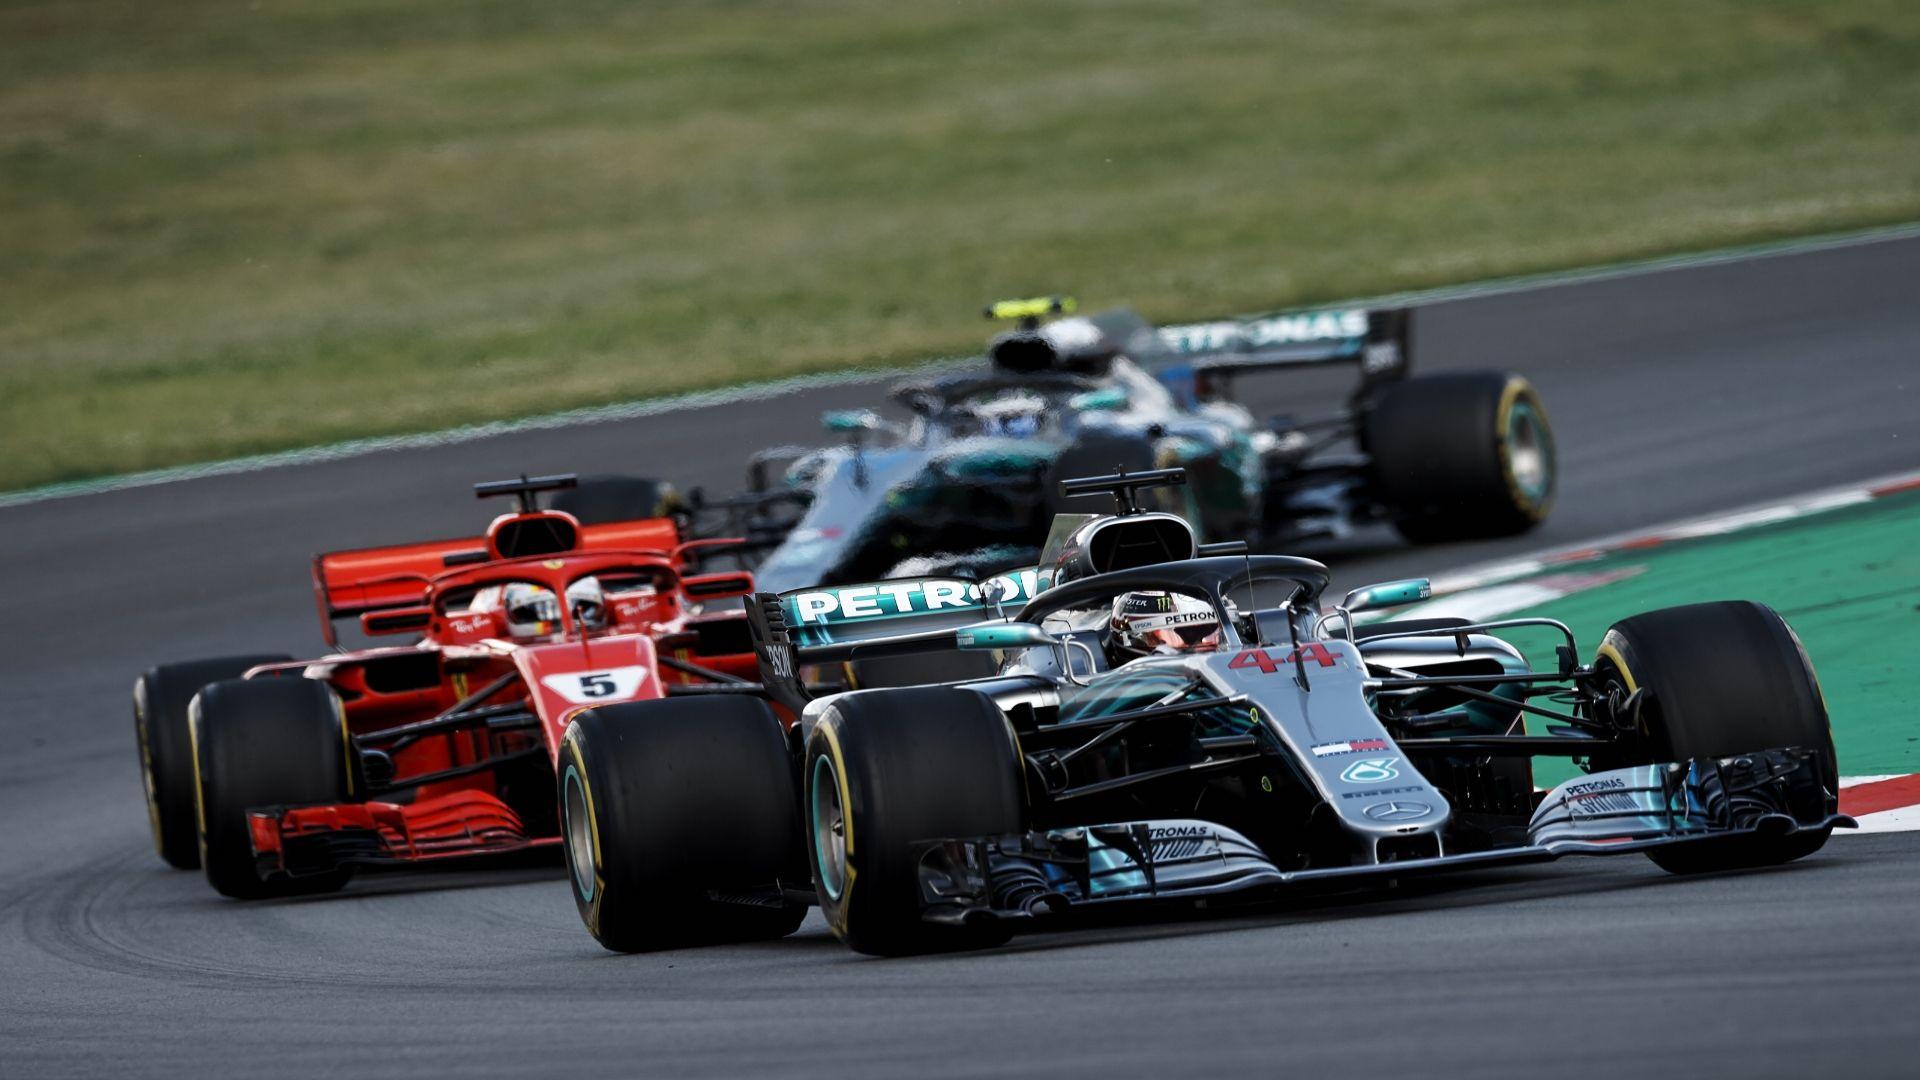 Why was Ferrari slower than Mercedes in Spain?